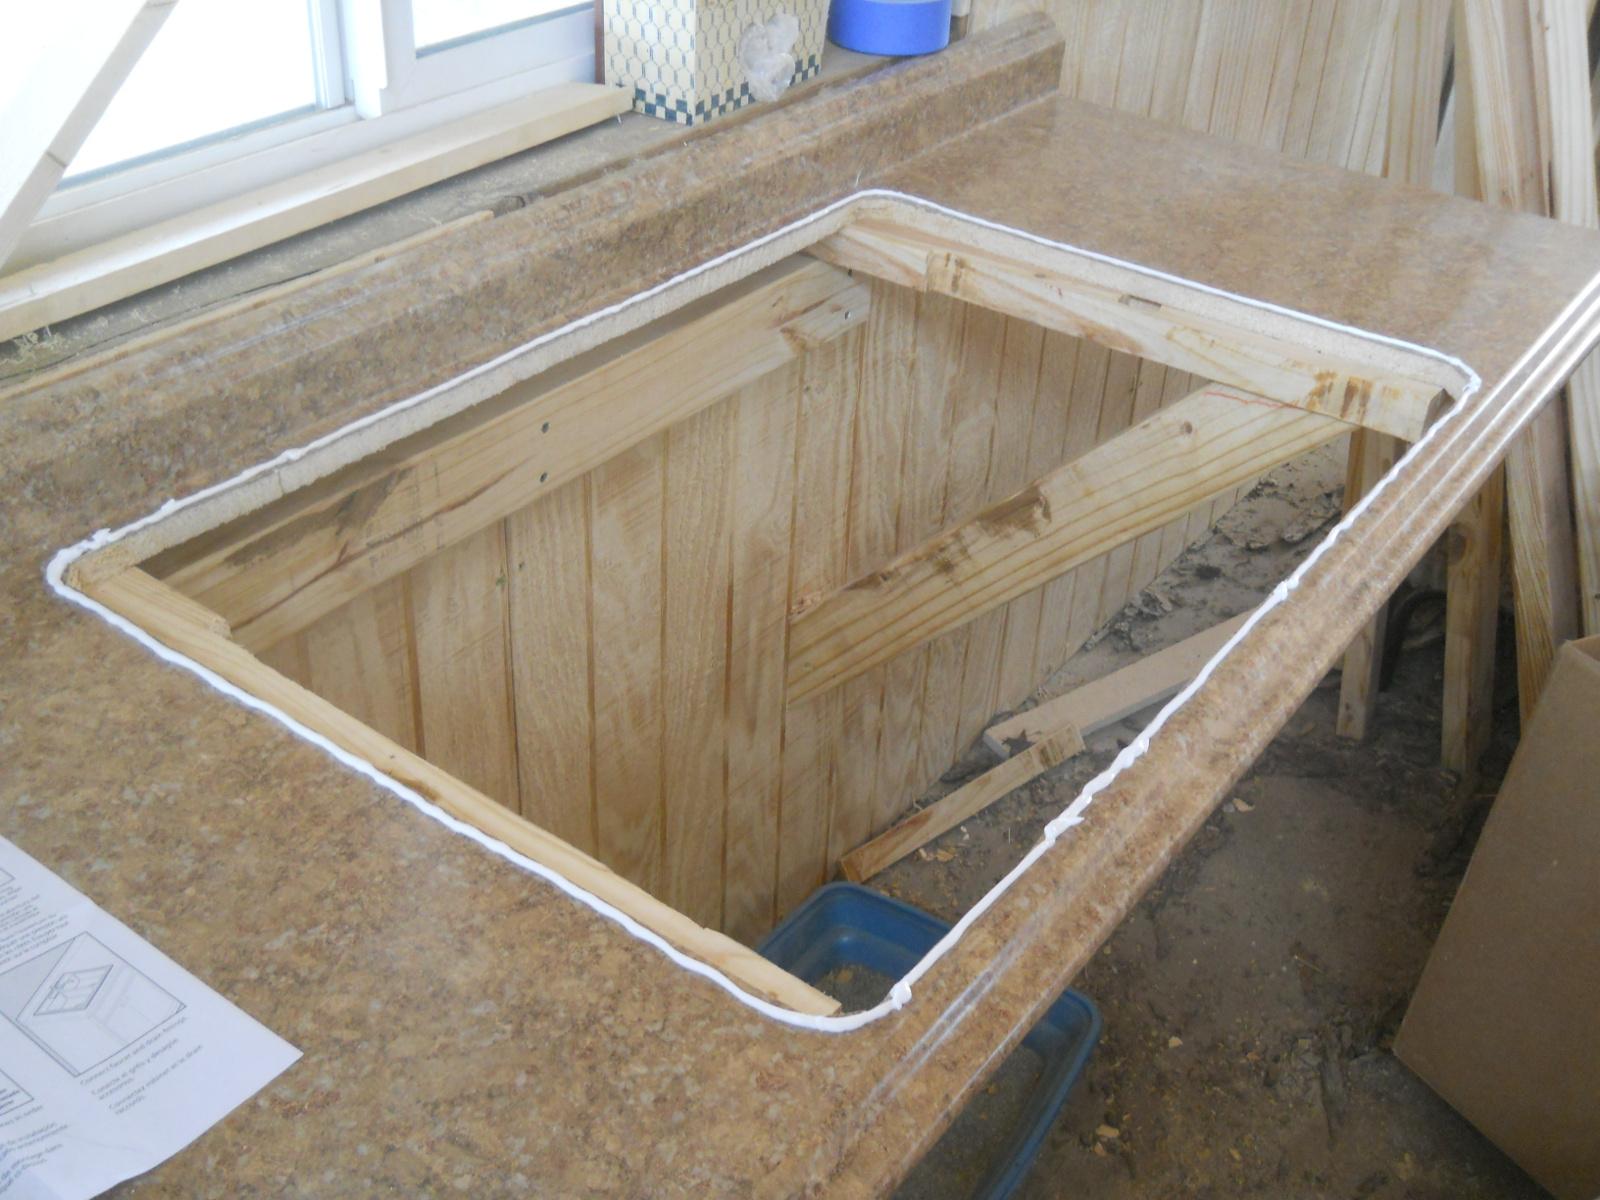 100 caulking kitchen backsplash install tile over for Caulking kitchen cabinets